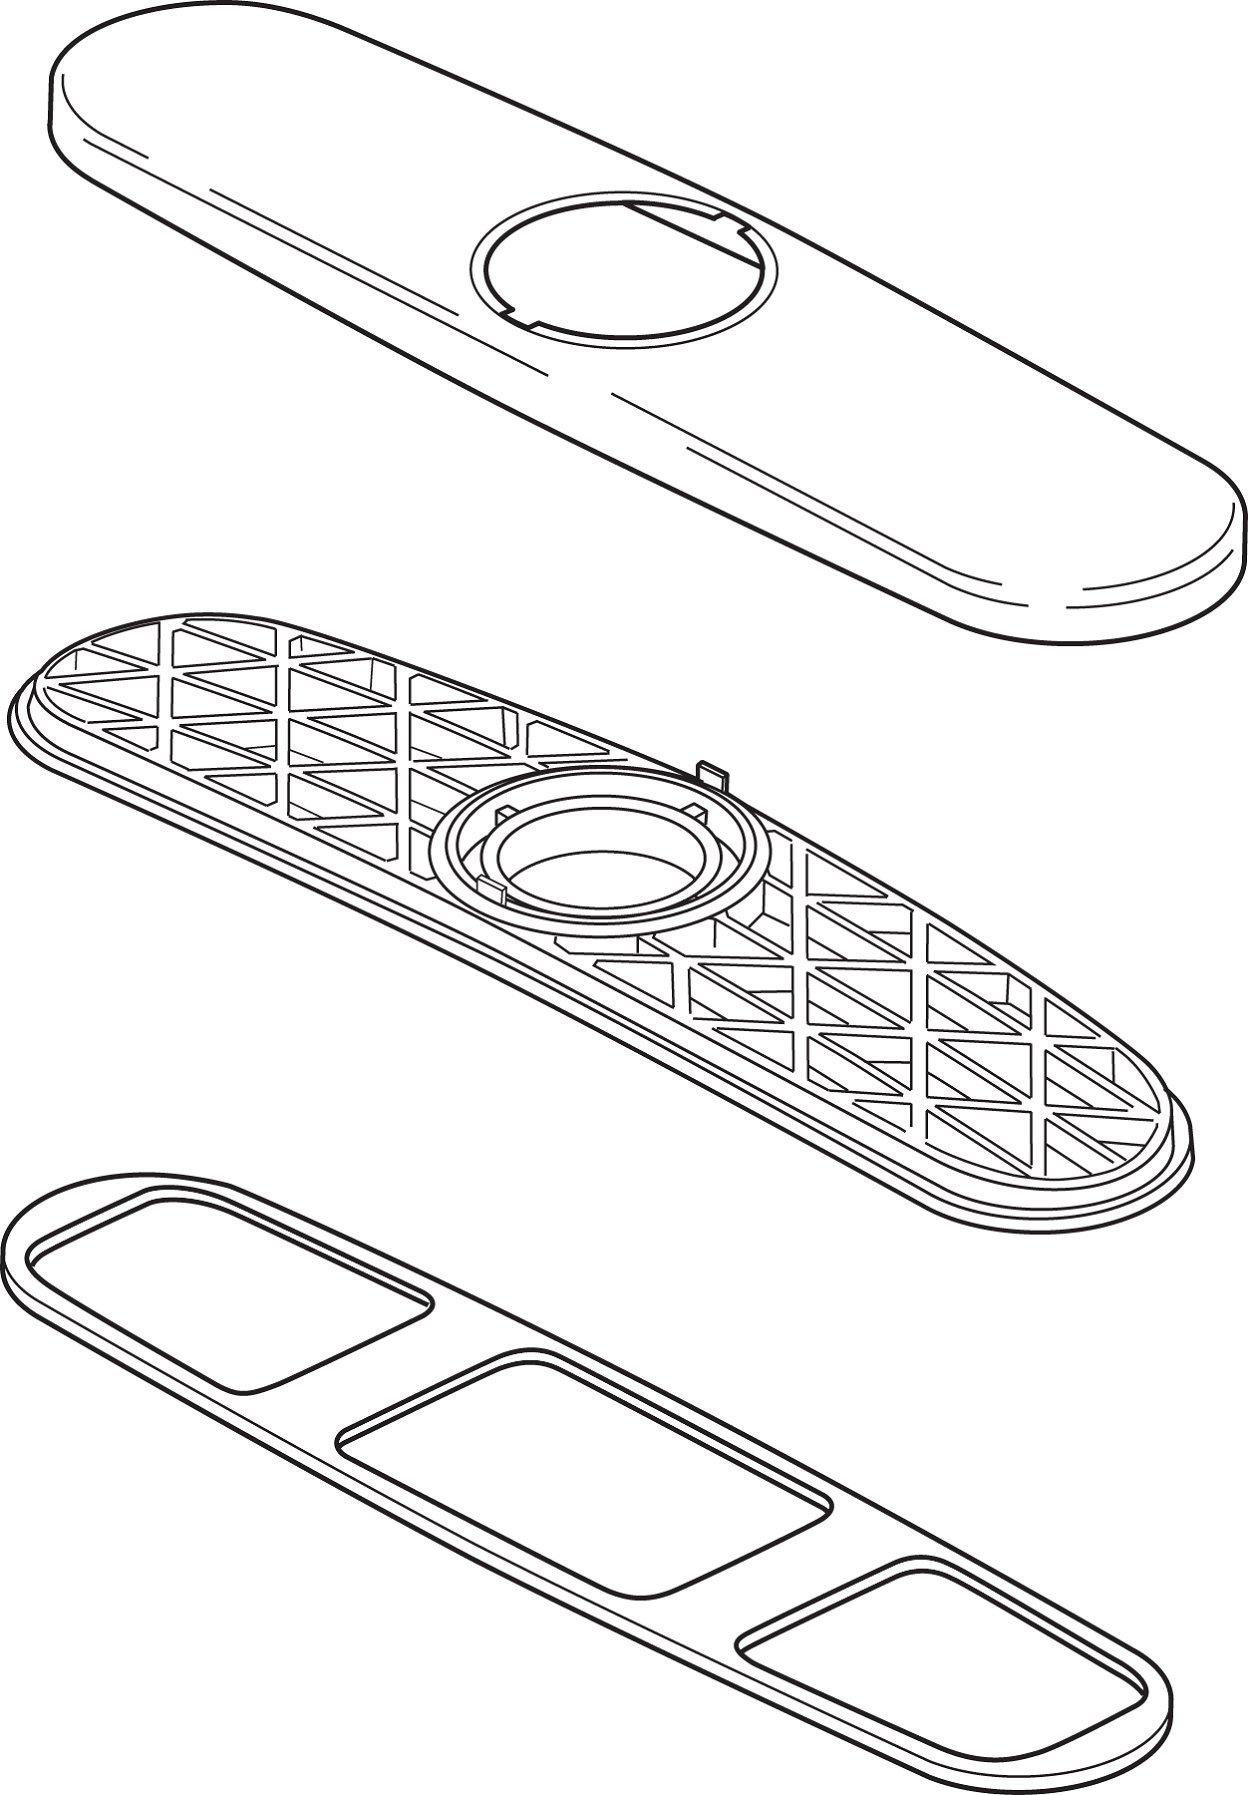 Delta Faucet RP64472 Allora Escutcheon, Base, and Gasket, Chrome